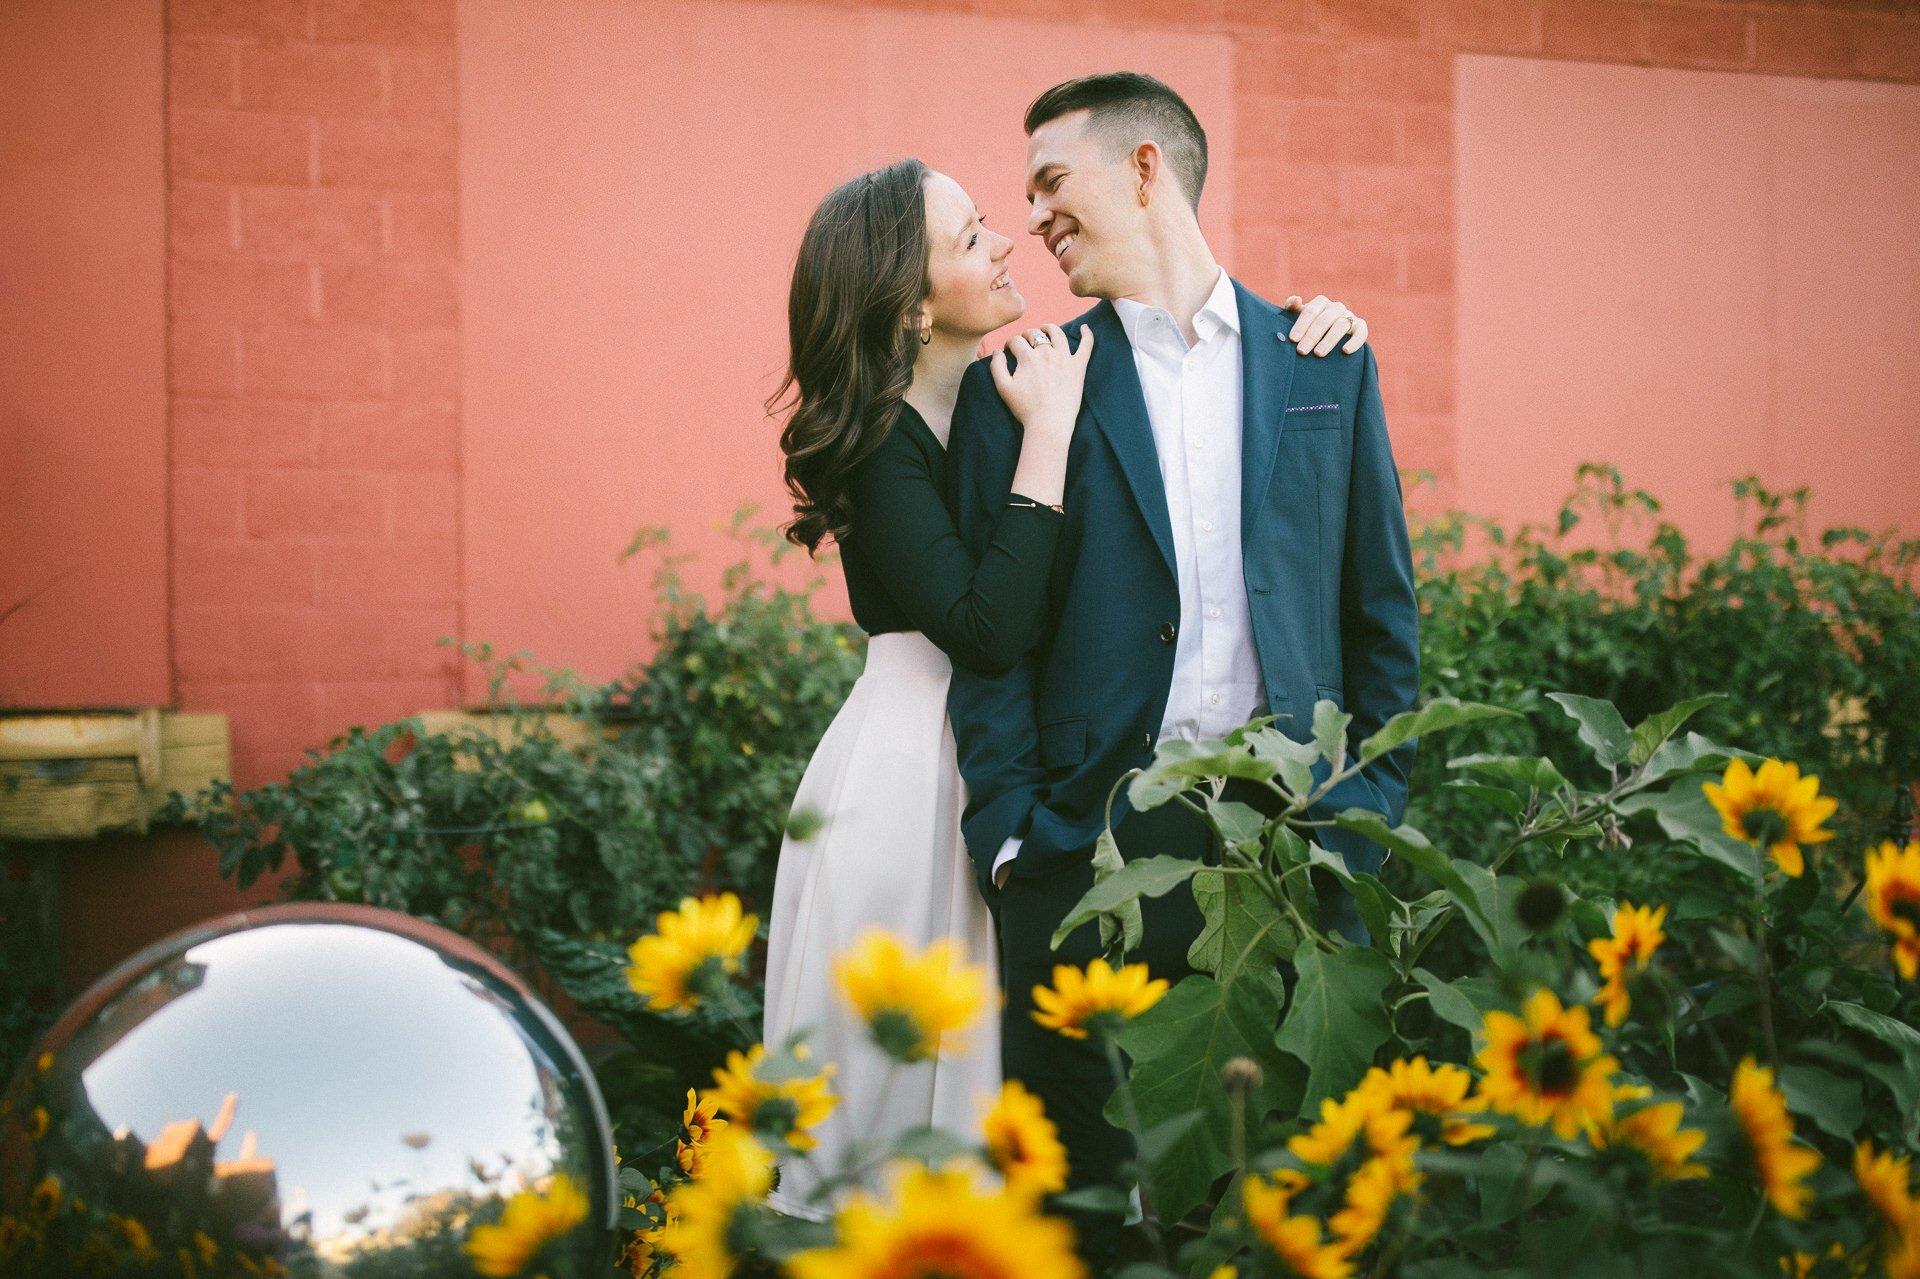 78th Street Studio Engagement and Wedding Photographer 13.jpg